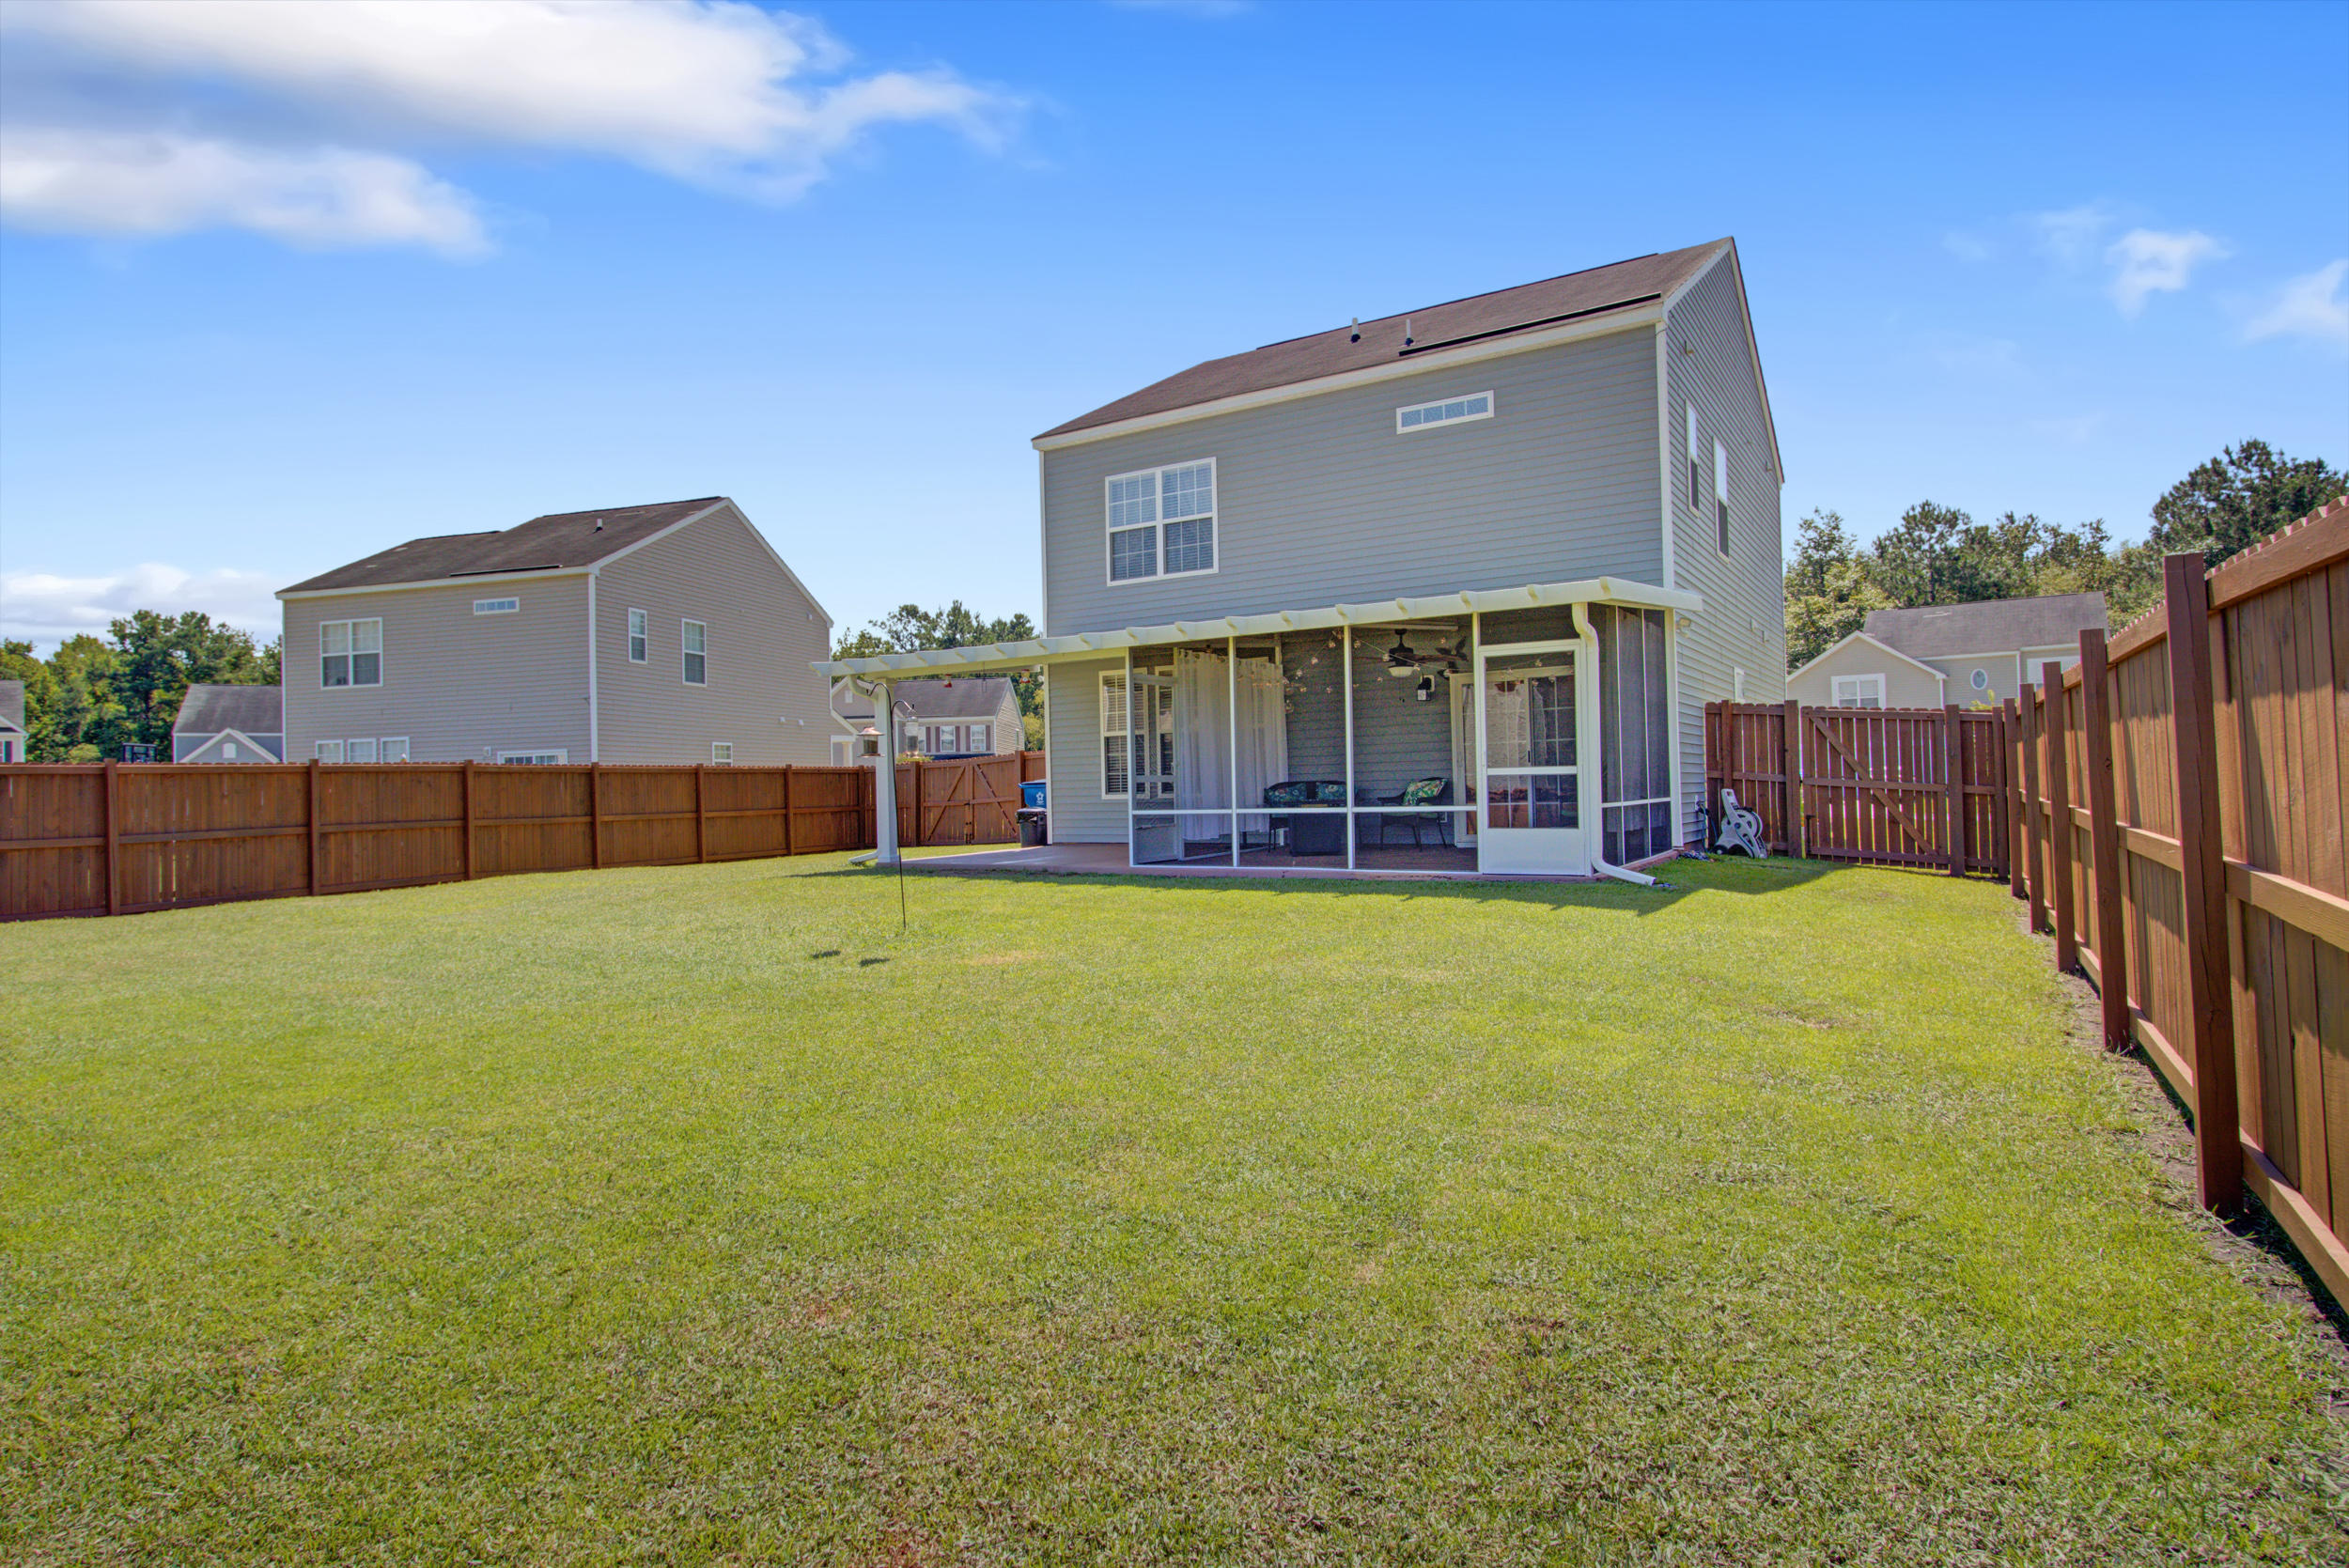 Oakley Pointe Homes For Sale - 576 English Oak, Moncks Corner, SC - 27